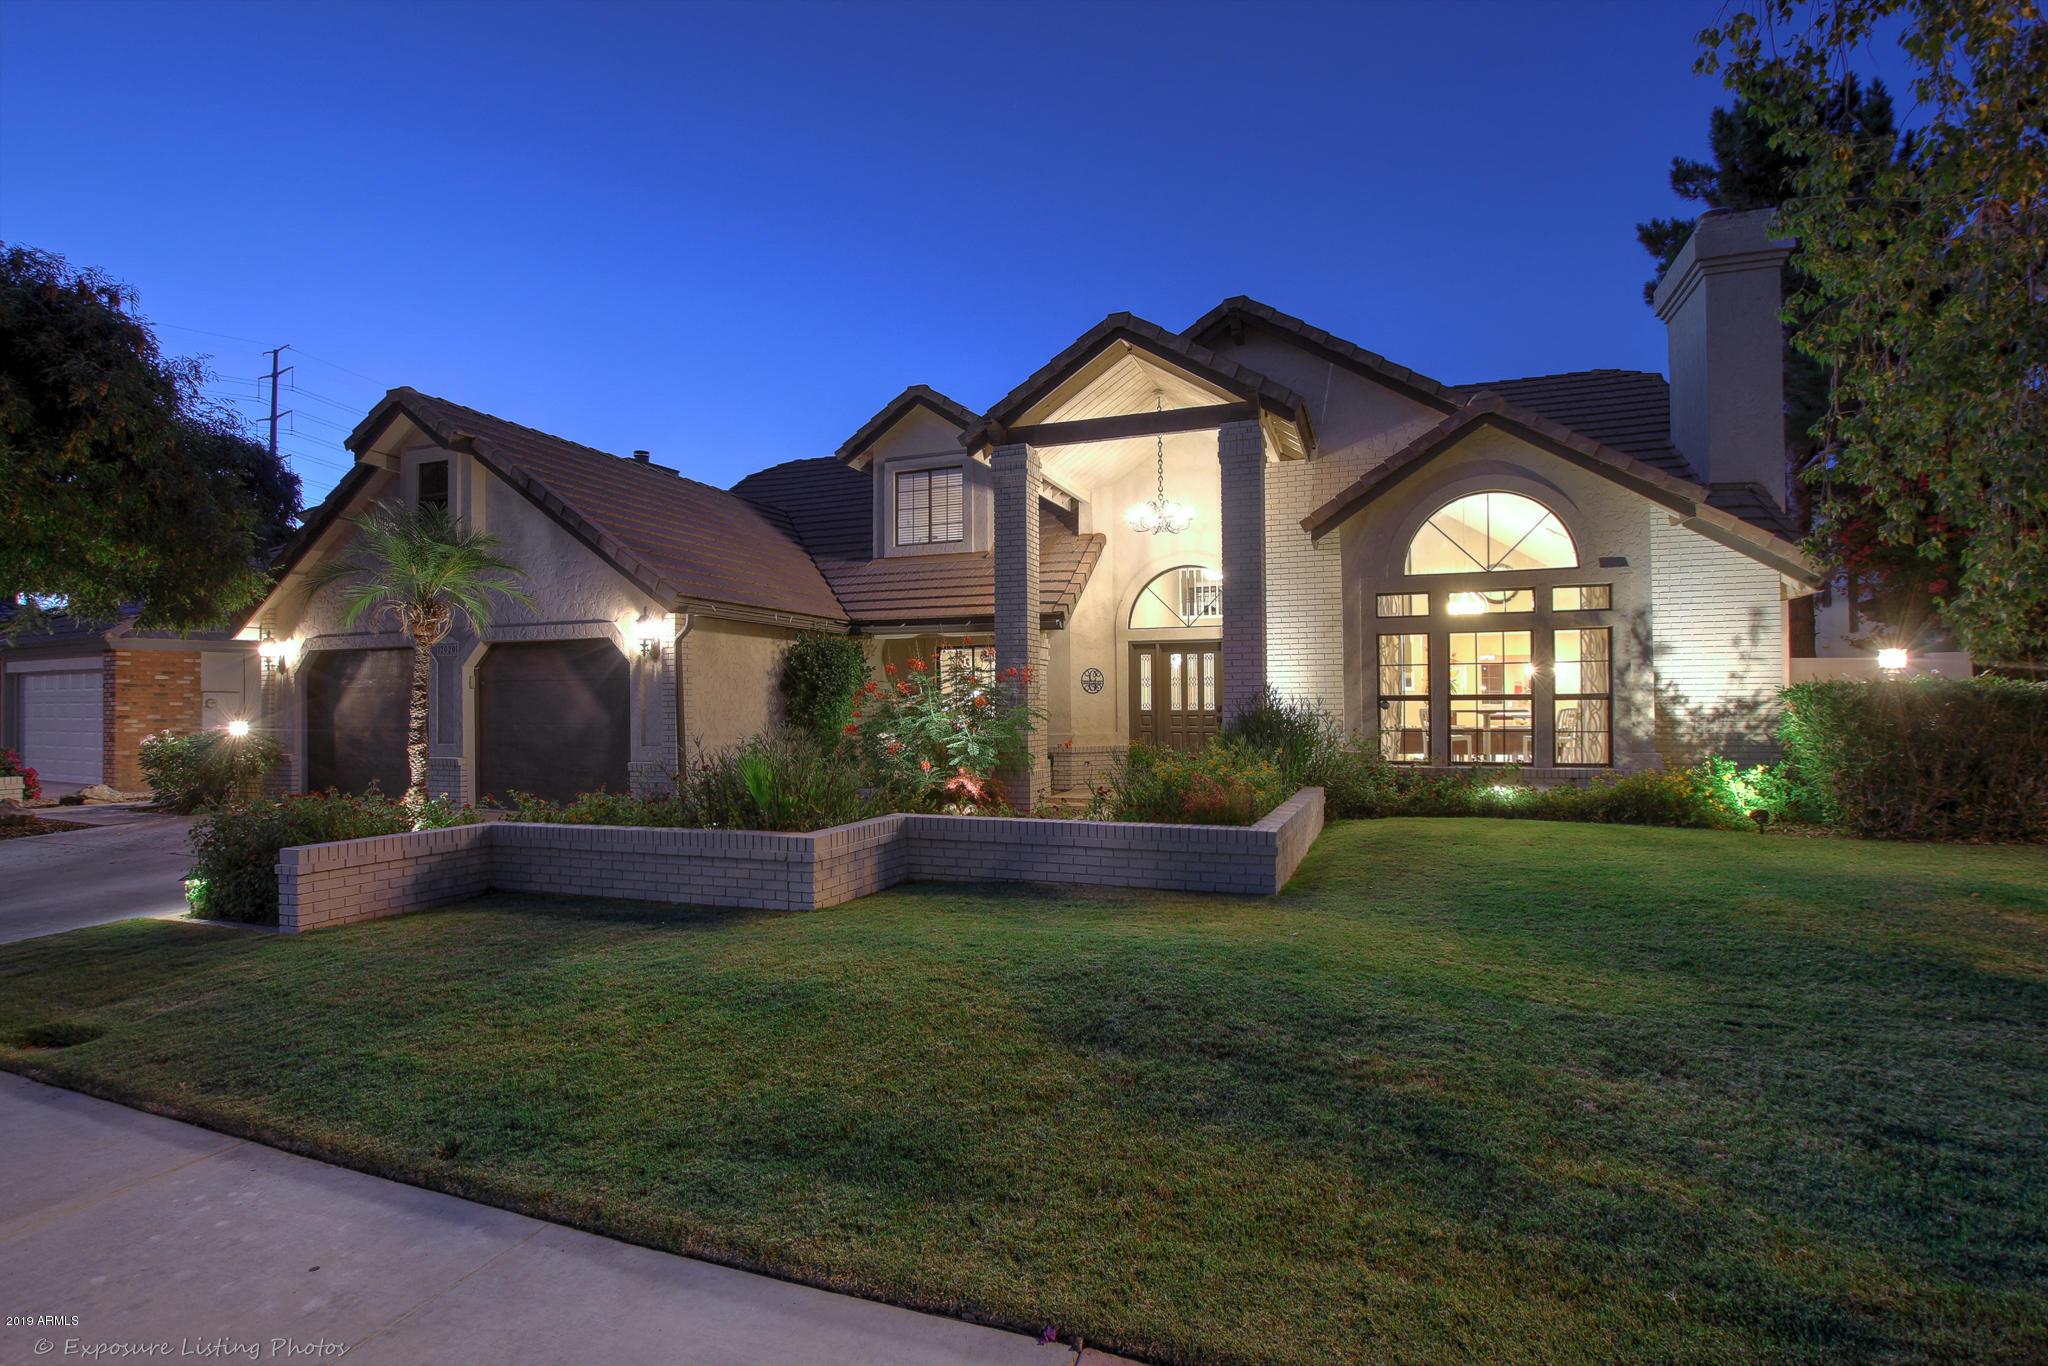 MLS 5945535 2020 E CATAMARAN Drive, Gilbert, AZ 85234 Gilbert AZ Val Vista Lakes